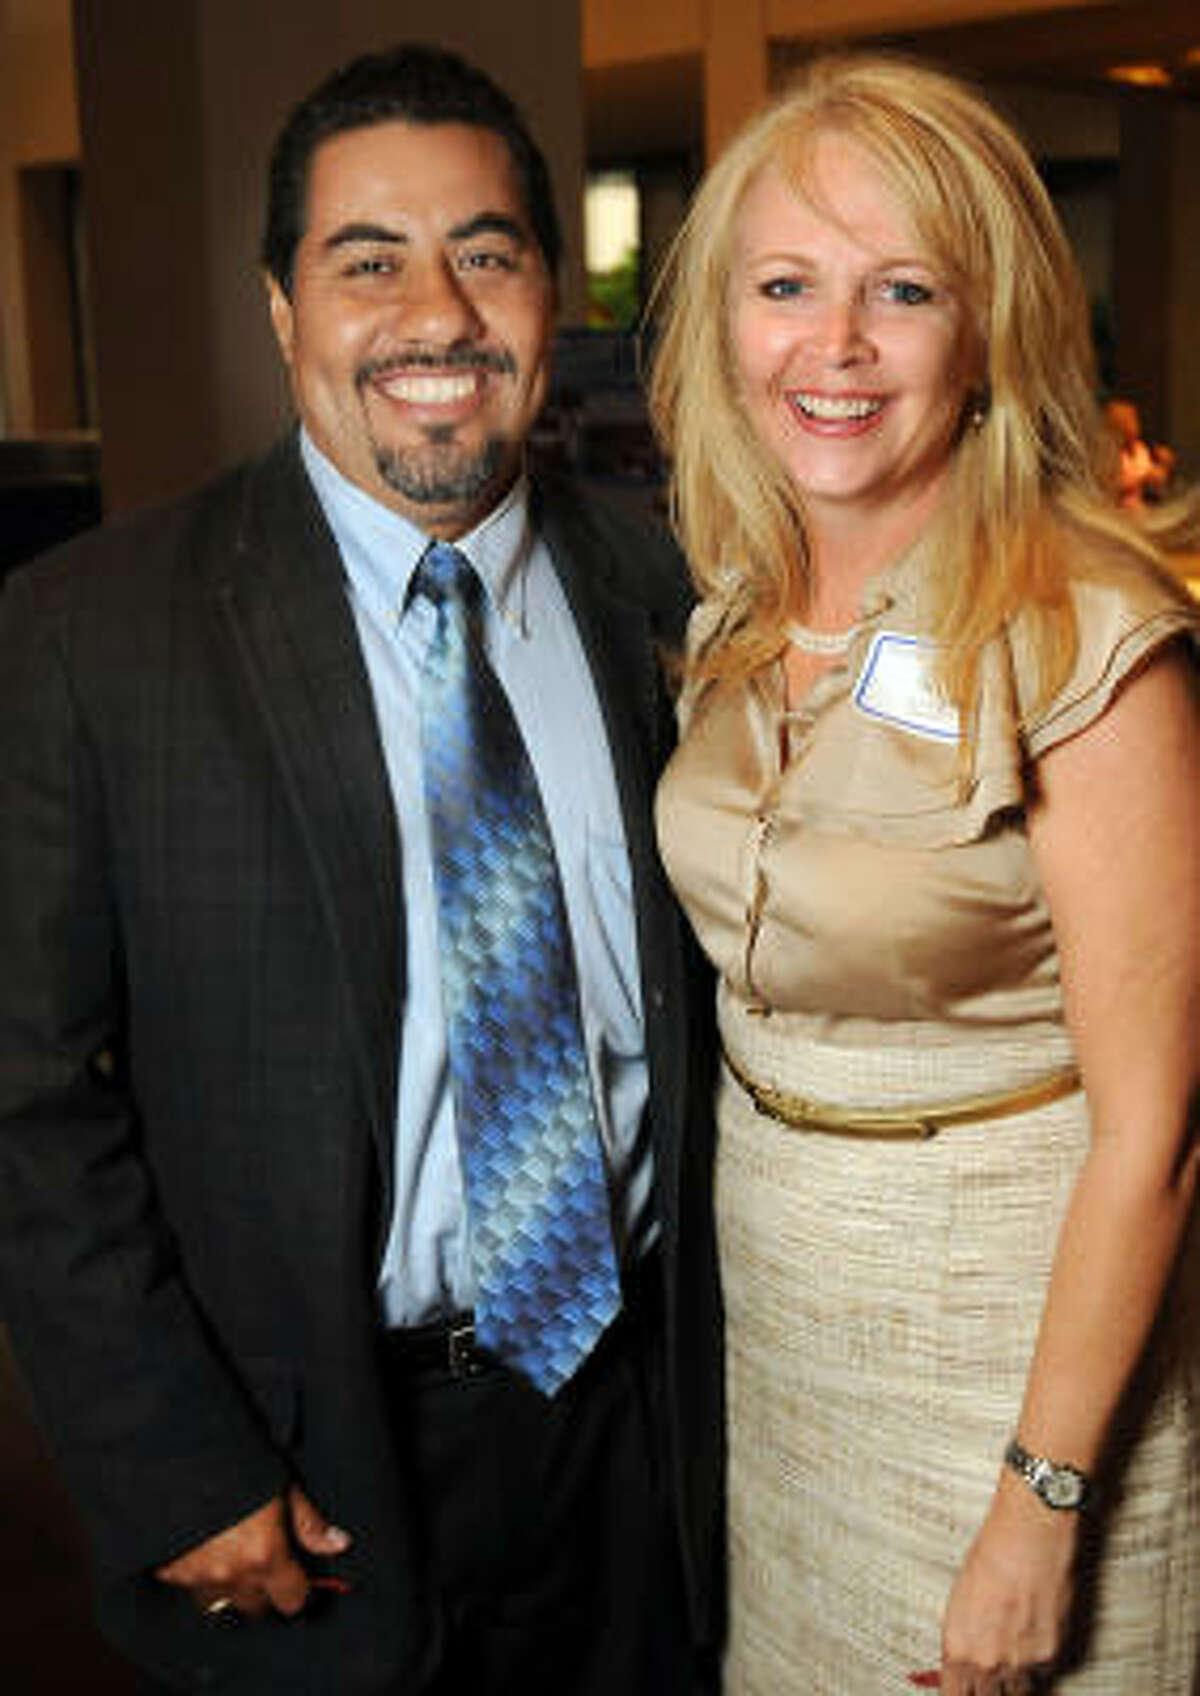 Frank Morales and Dana Nance